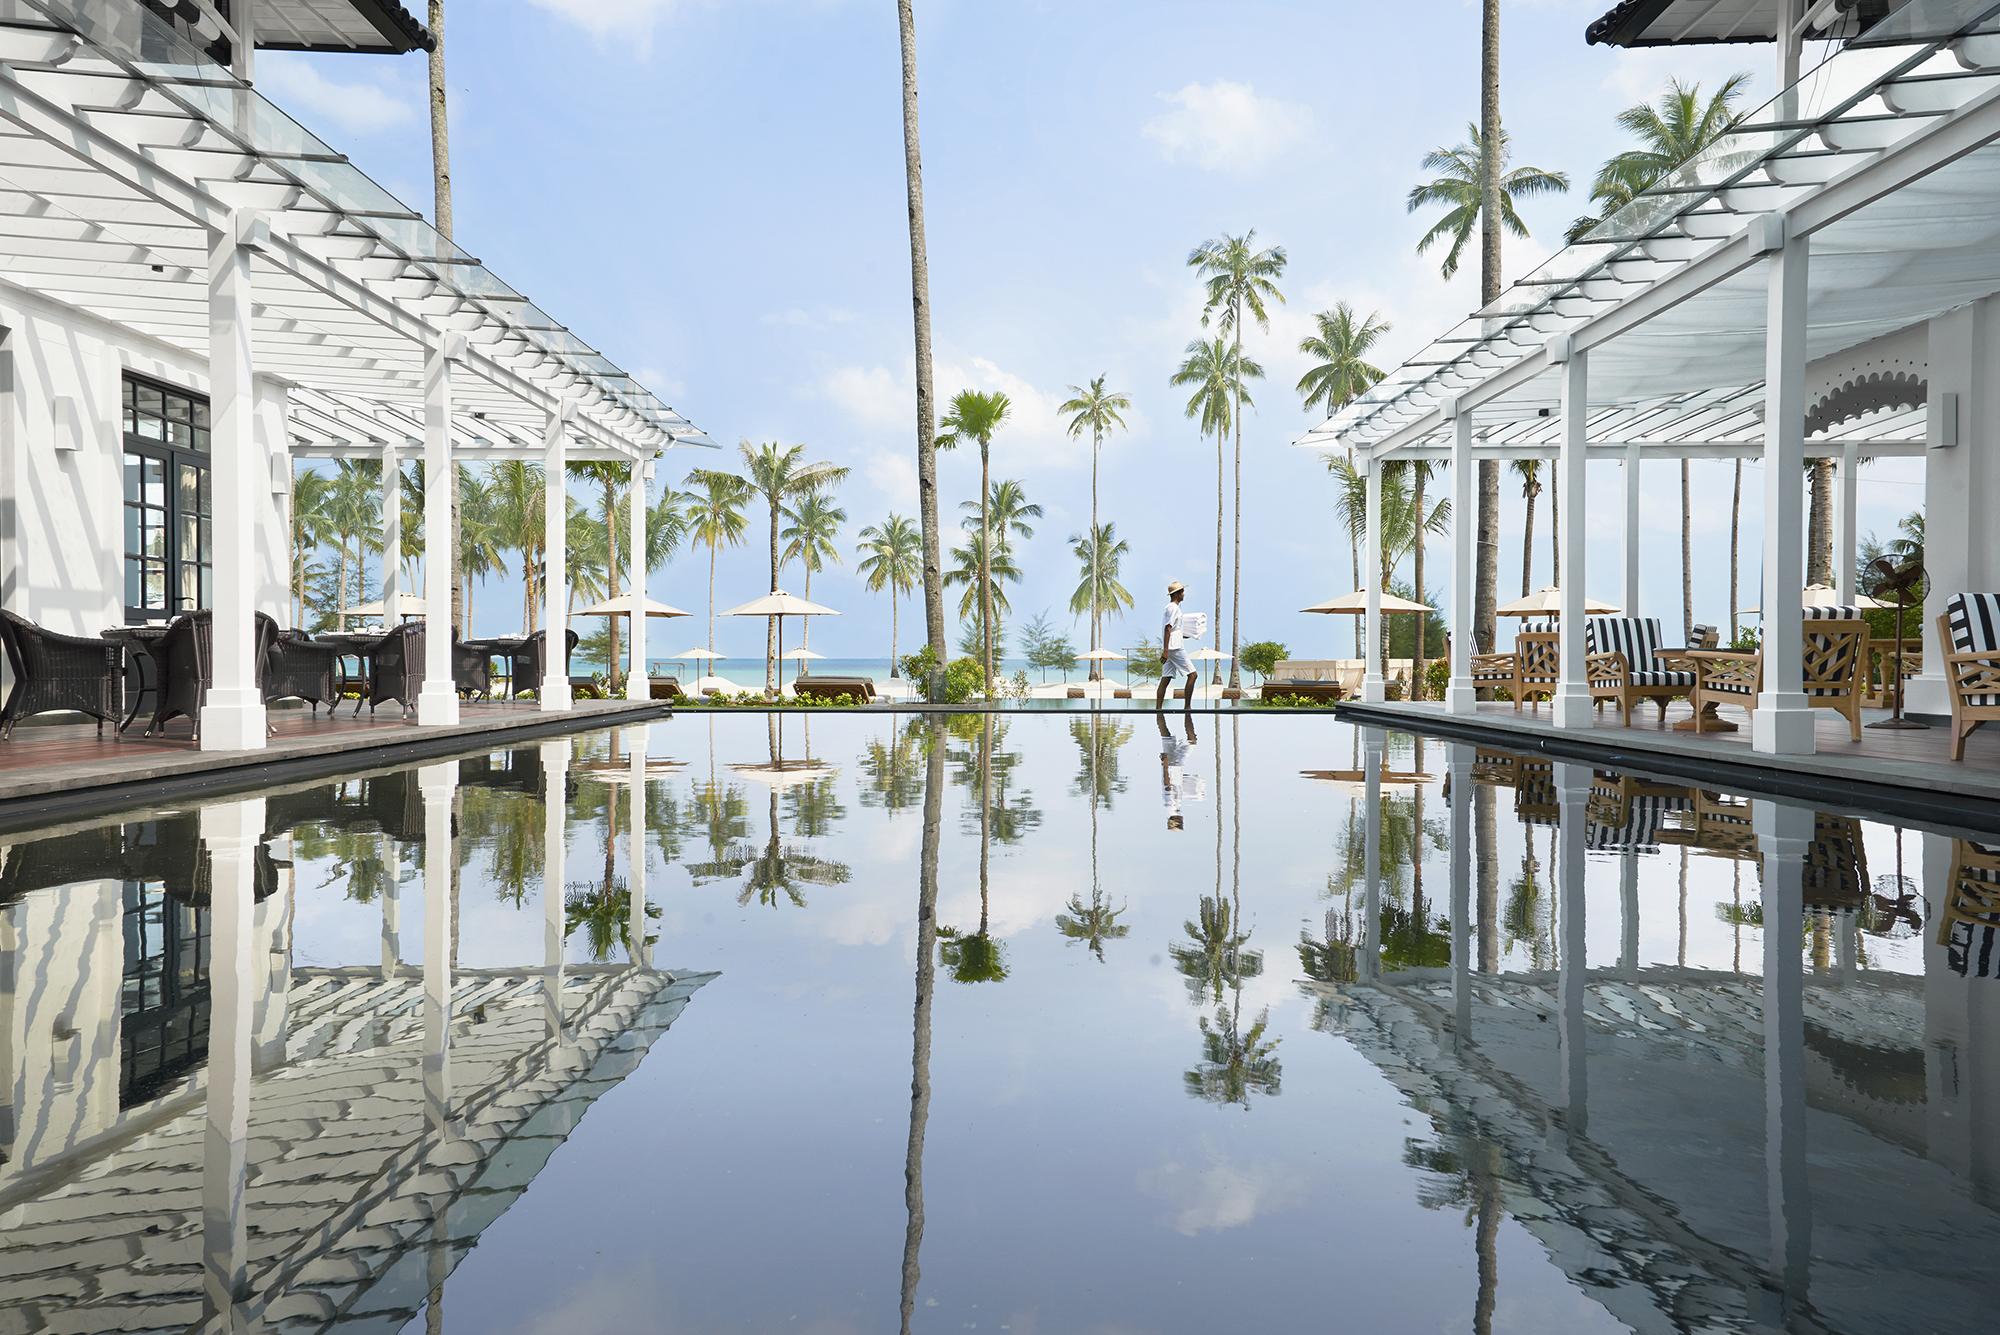 Pool at The Sanchaya Resort, Bintan, Indonesia (Image courtesy of The Sanchaya)